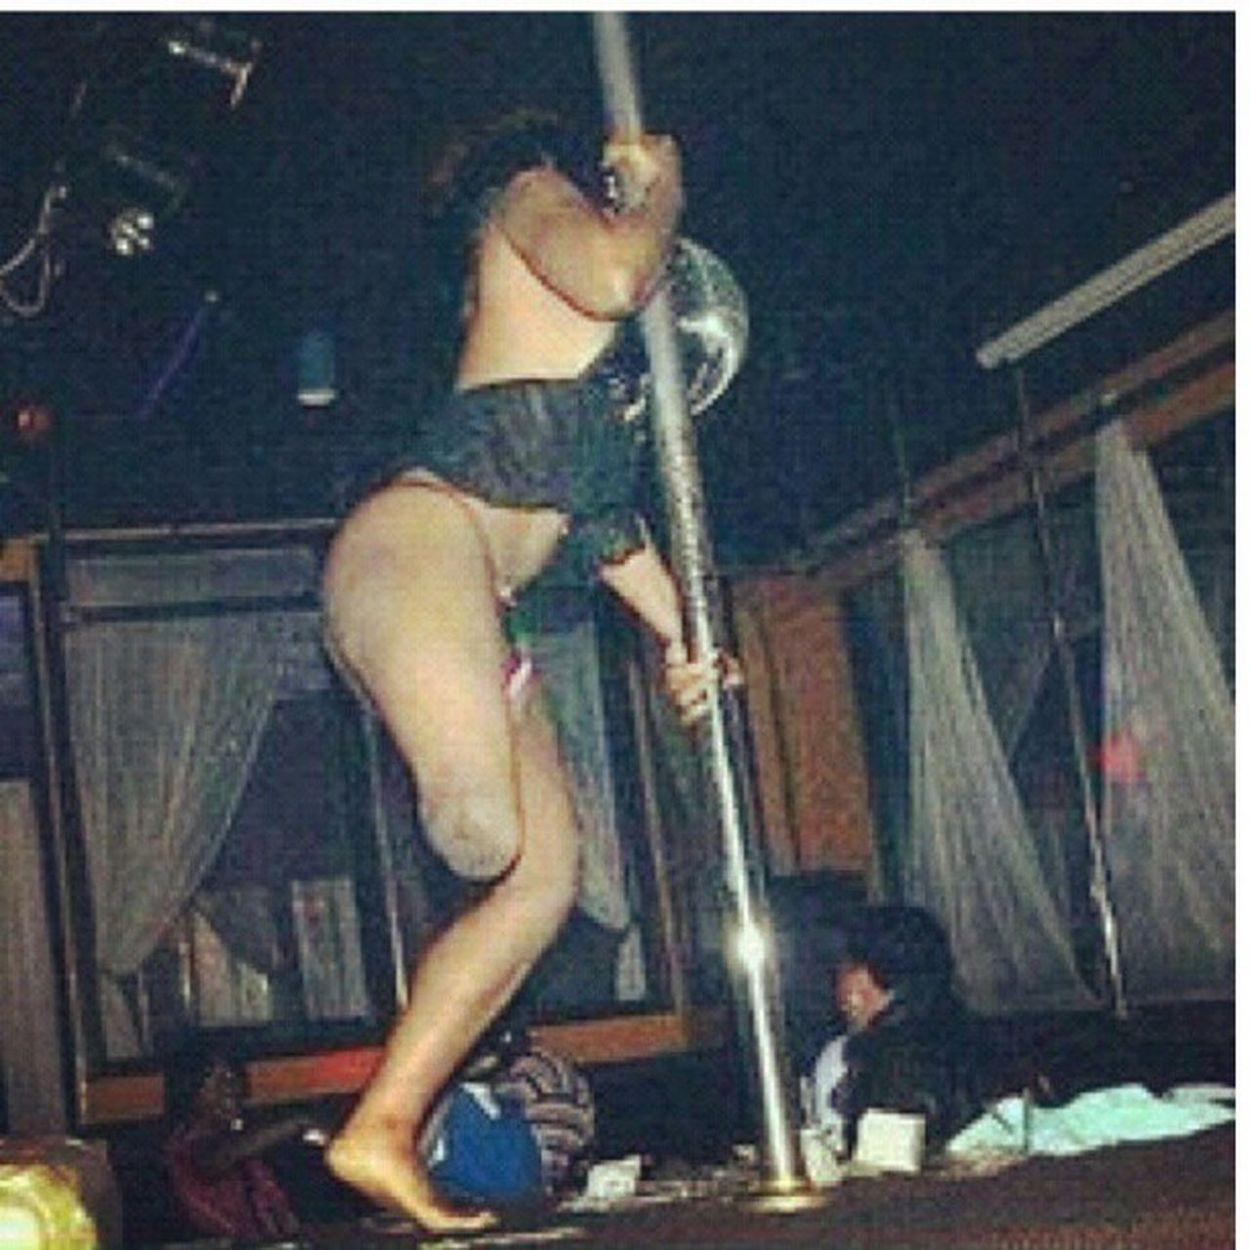 One legged stripper? Dead Lmaoooo Pegleg PirateStrippin TooFunny SupportTheNakedHustle Lmao omg kodMondays OhShit GotReal WhereTheyDoThatAt